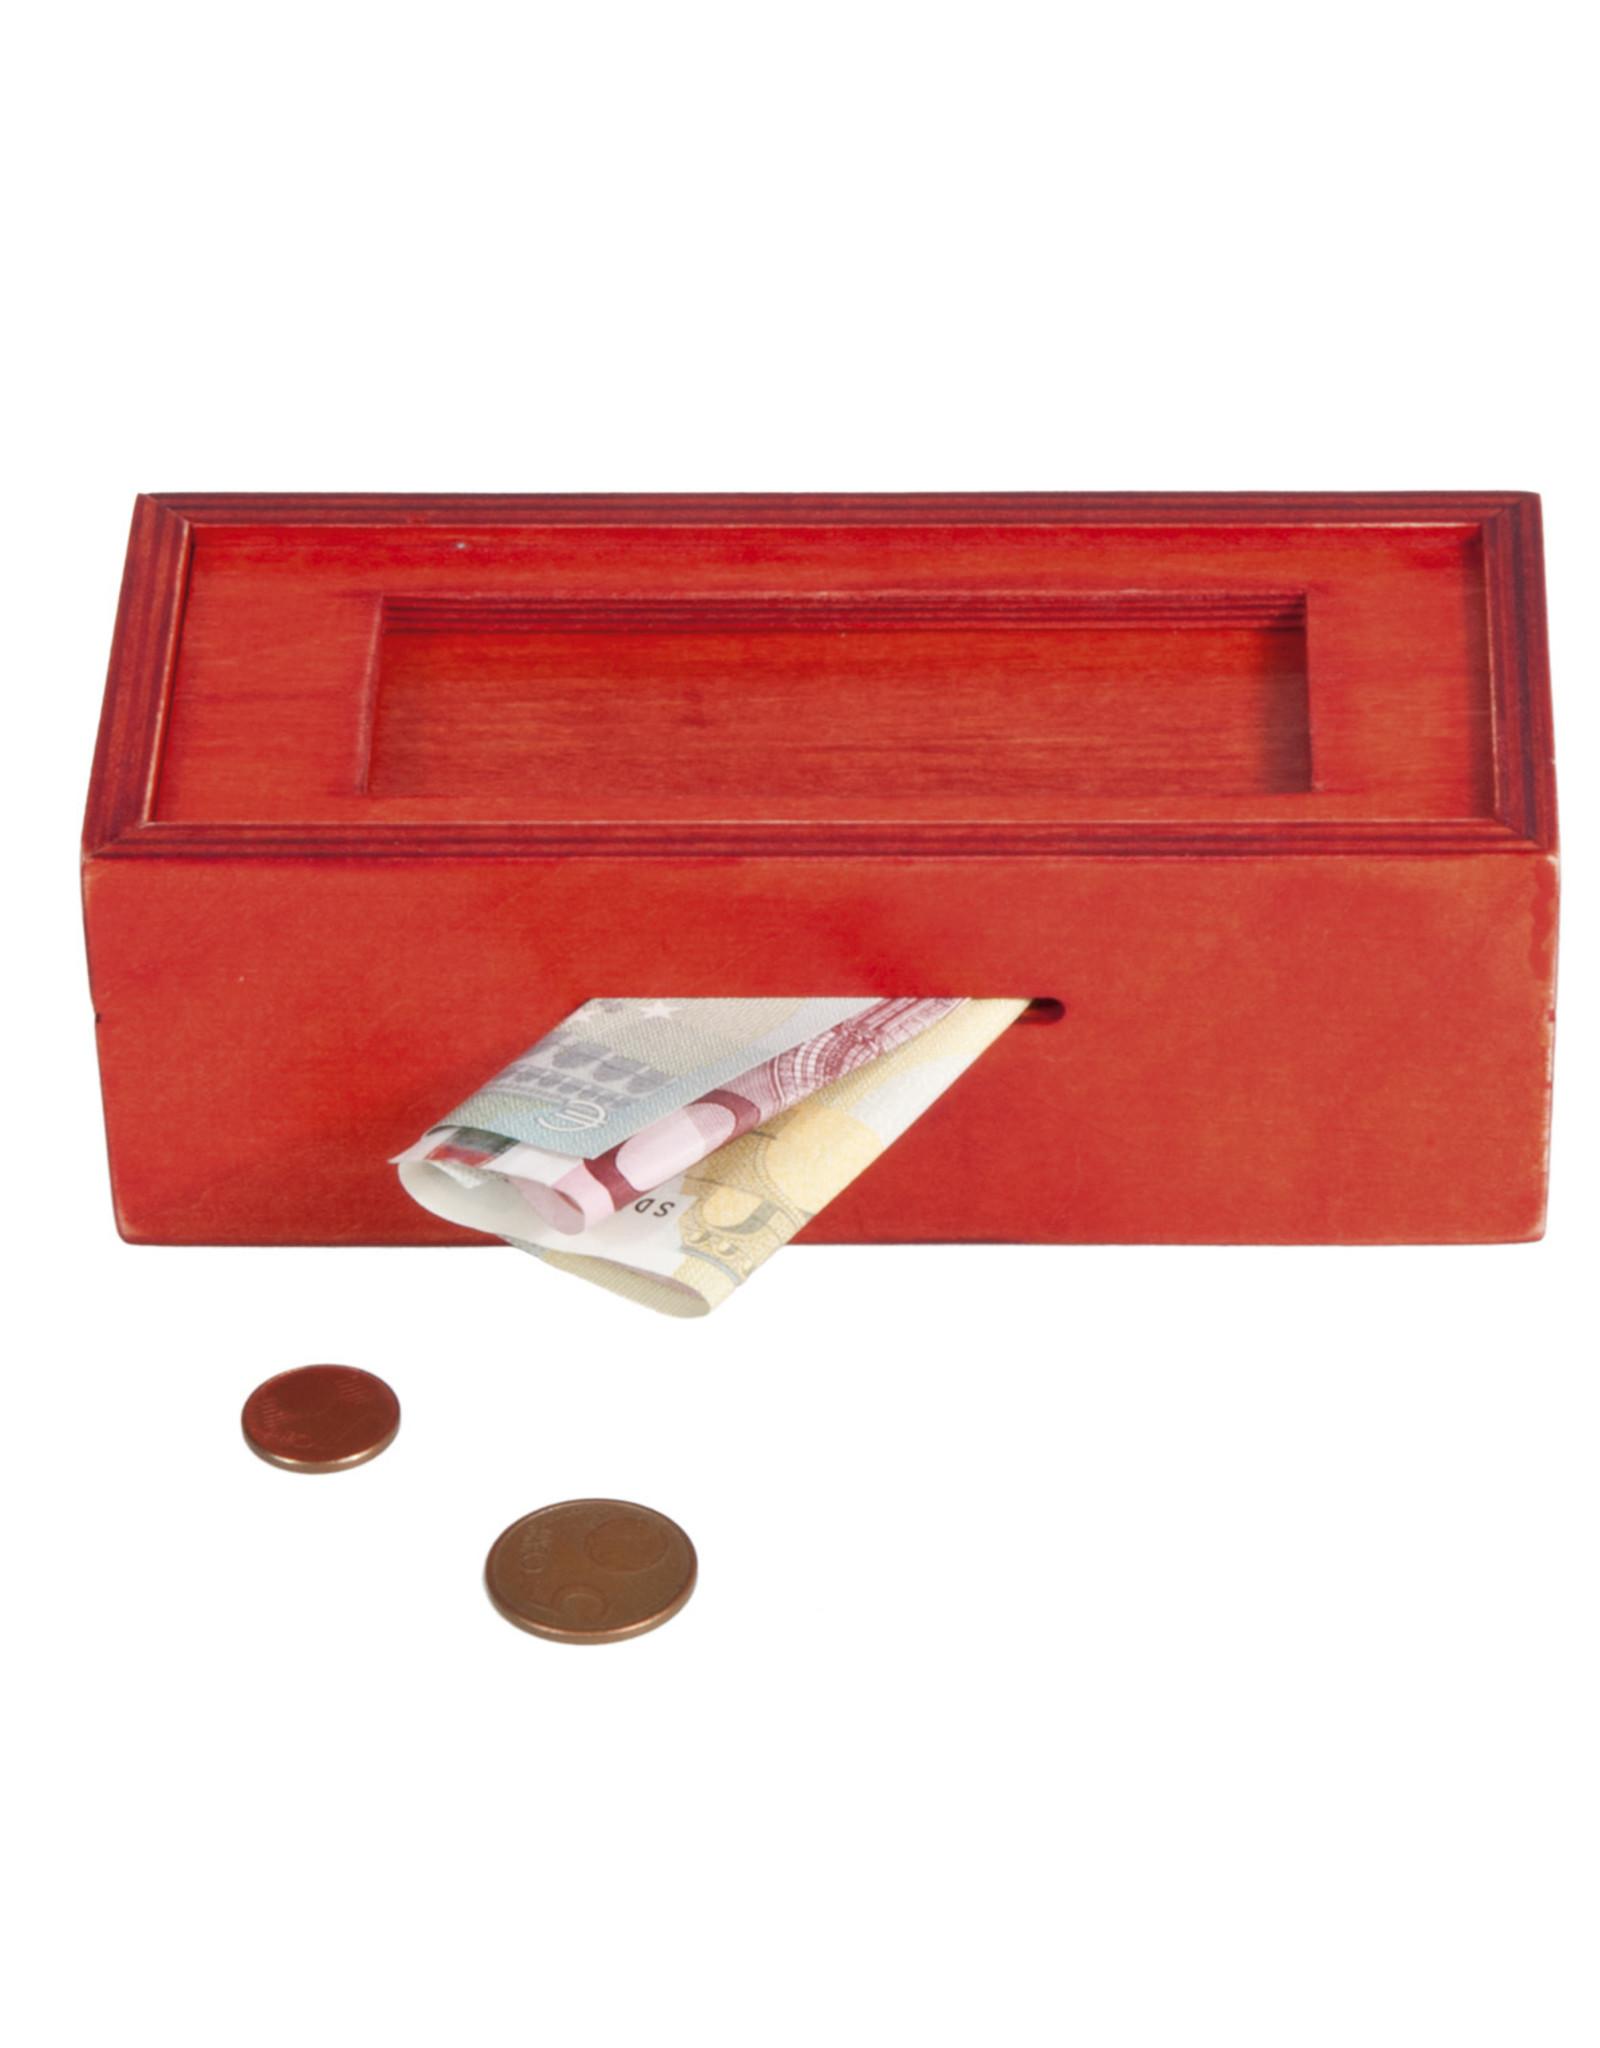 Fridolin IQ Test: Trick Box for Money